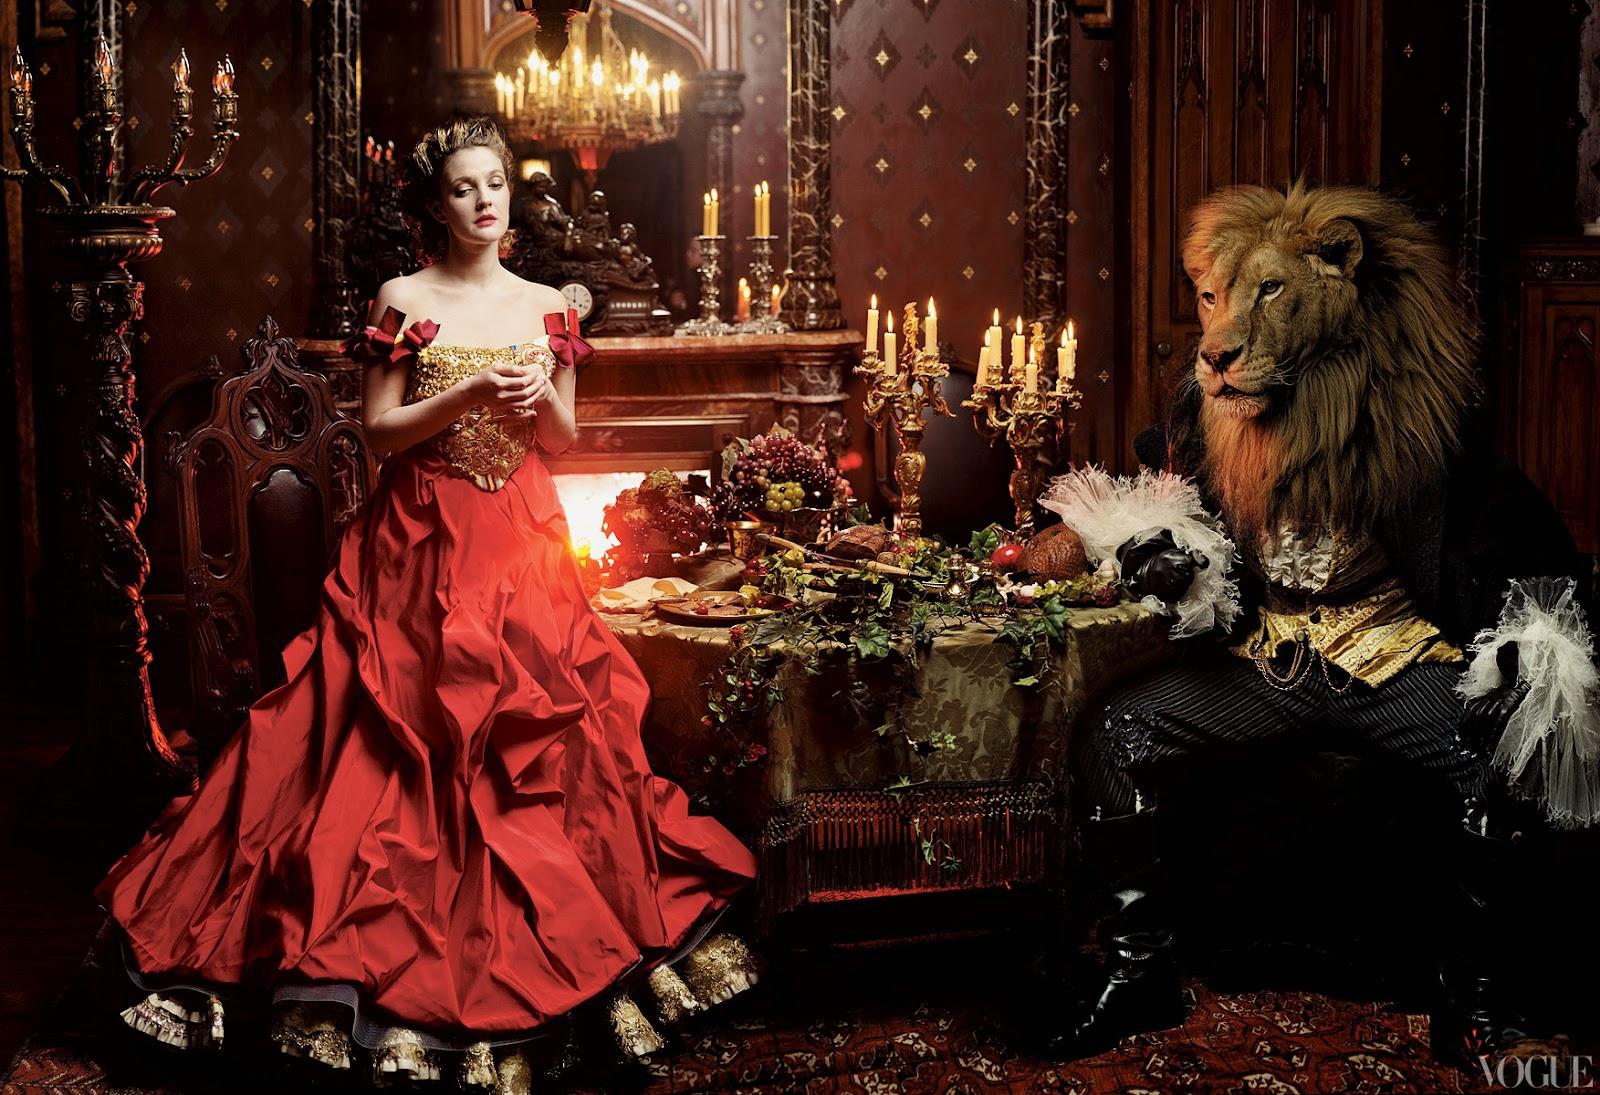 http://3.bp.blogspot.com/-kFhCWSmr5mY/T34745Gfe3I/AAAAAAAABt8/ZjkTxbFit44/s1600/fairy-tales-2005-04-annie-leibovitz-1_173846979942.jpg